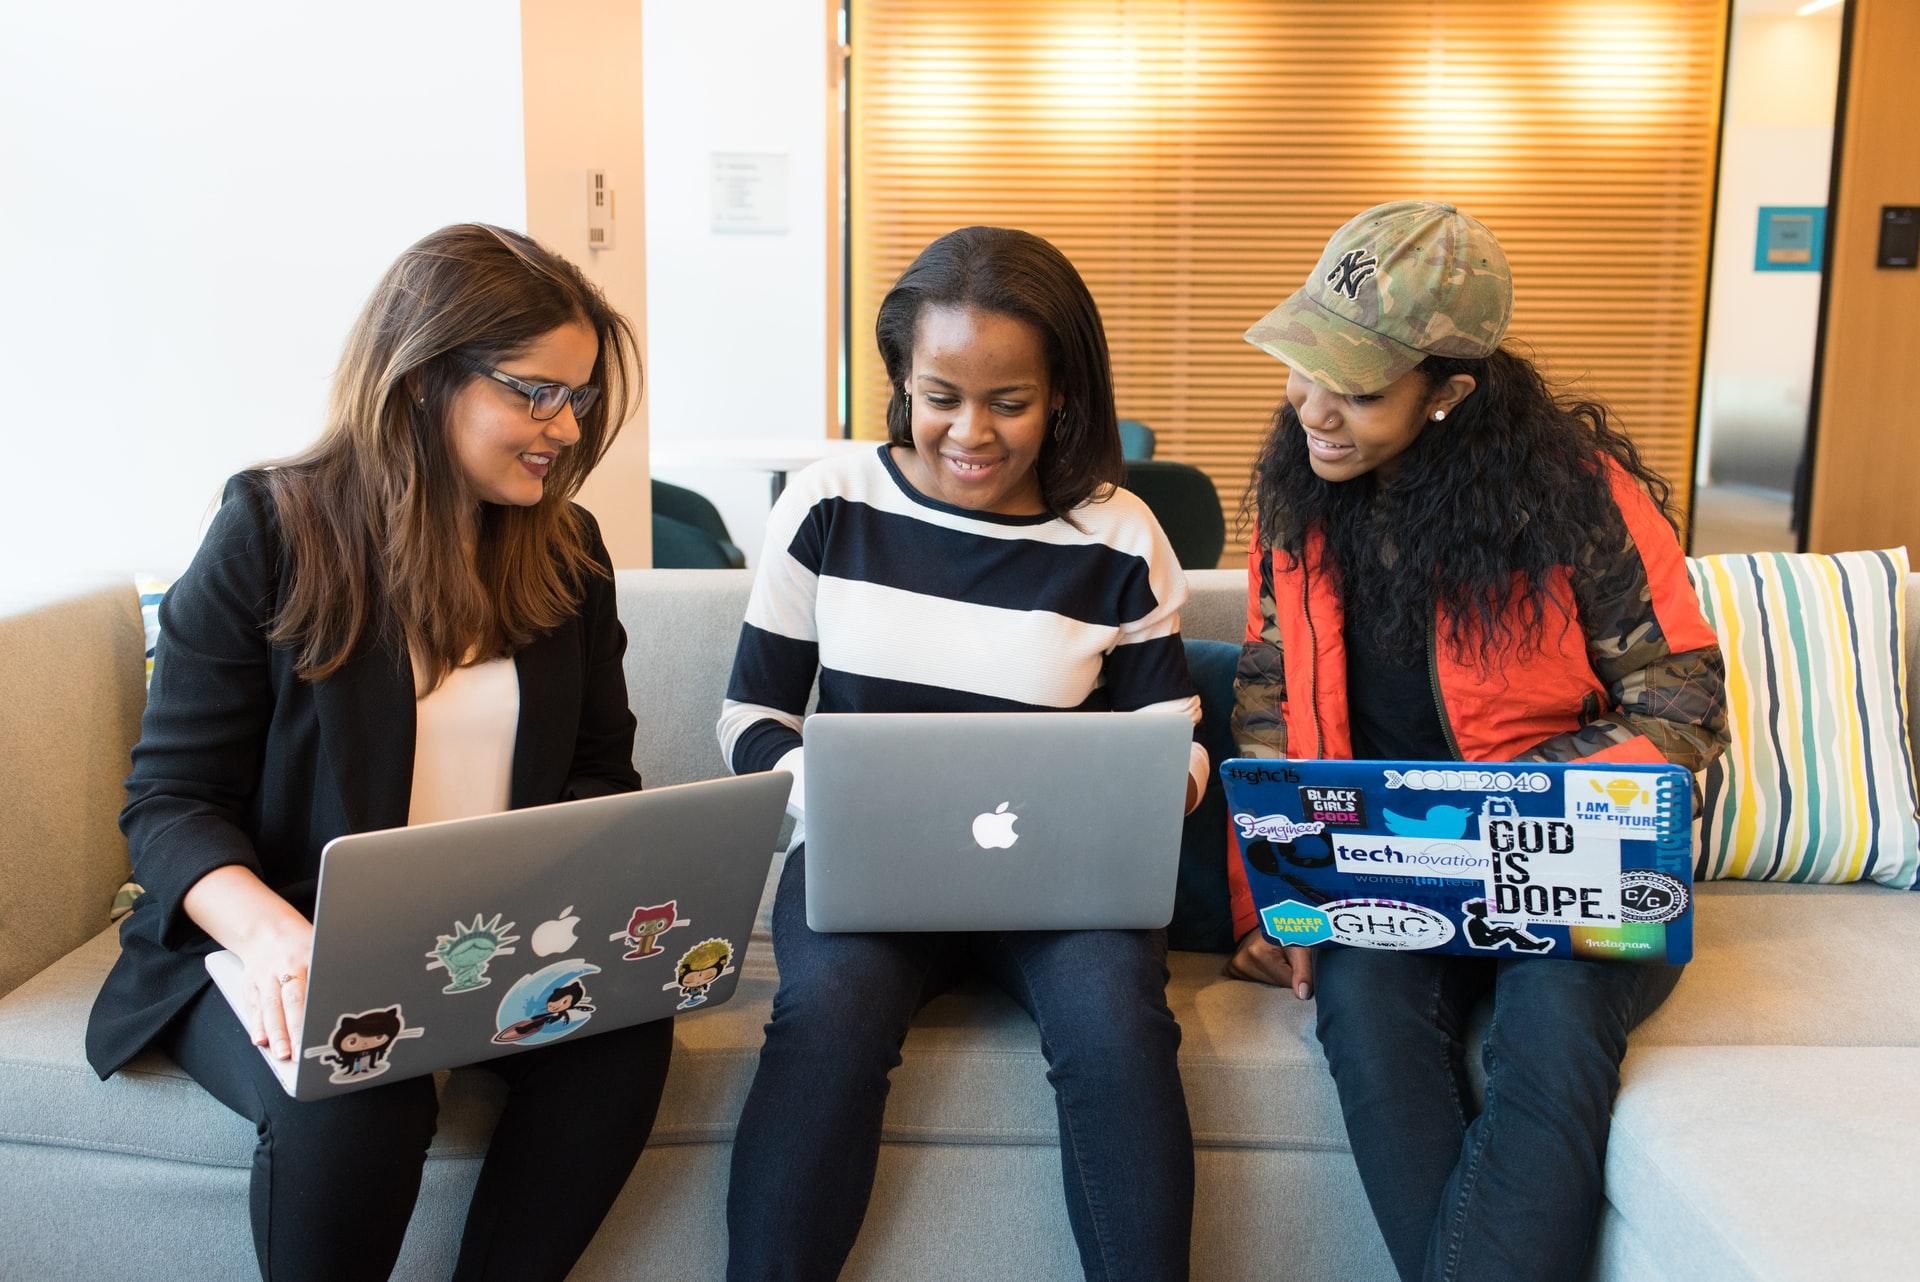 Three women working around a computer in an office.